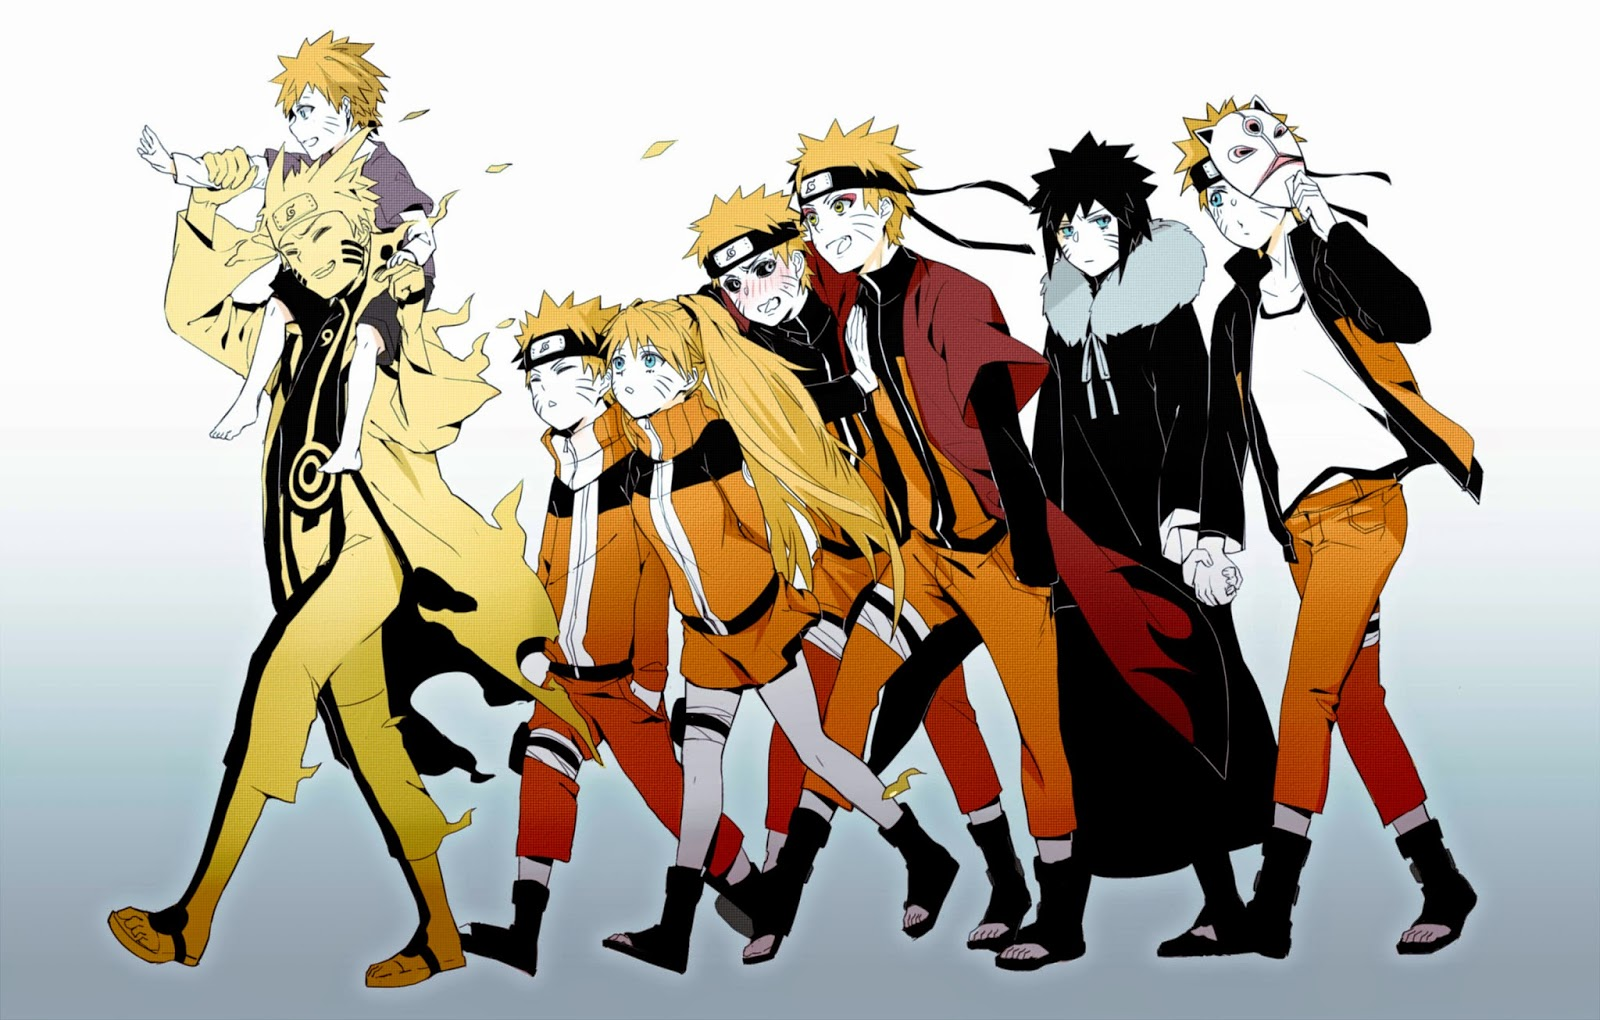 Kumpulan Gambar Naruto | Gambar Lucu Terbaru Cartoon Animation ...